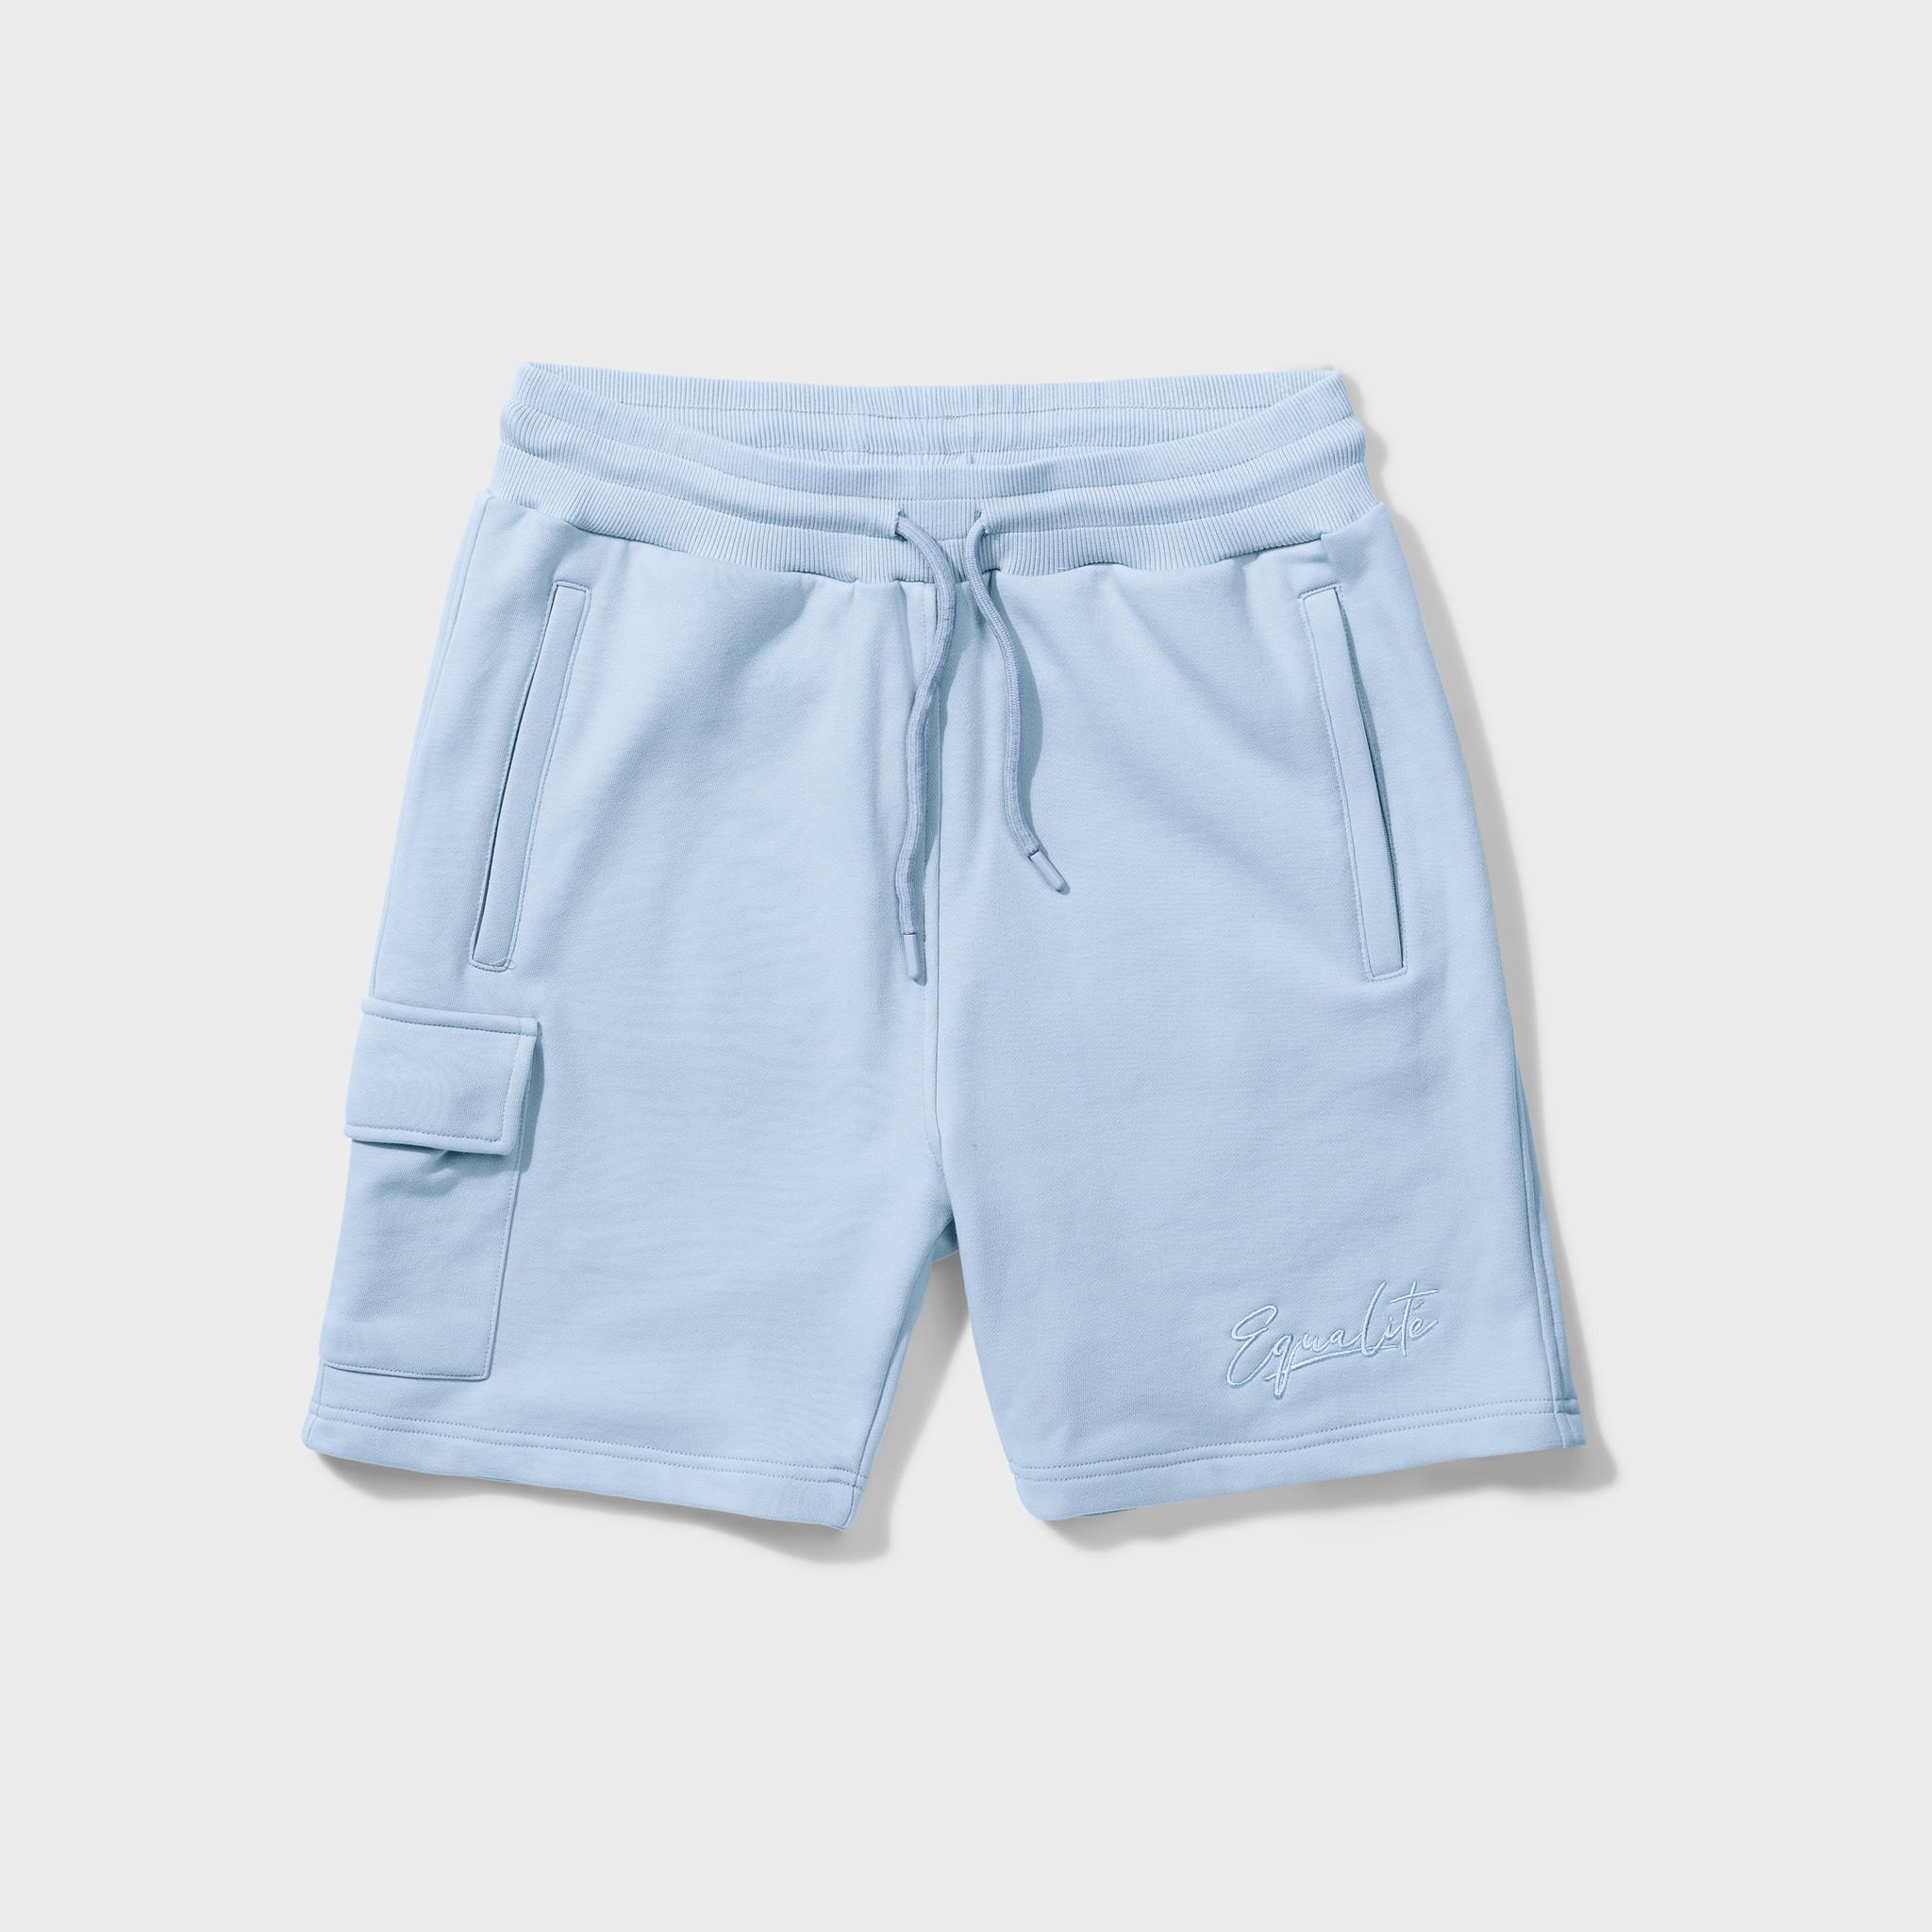 Wafi signature shorts light blue-1